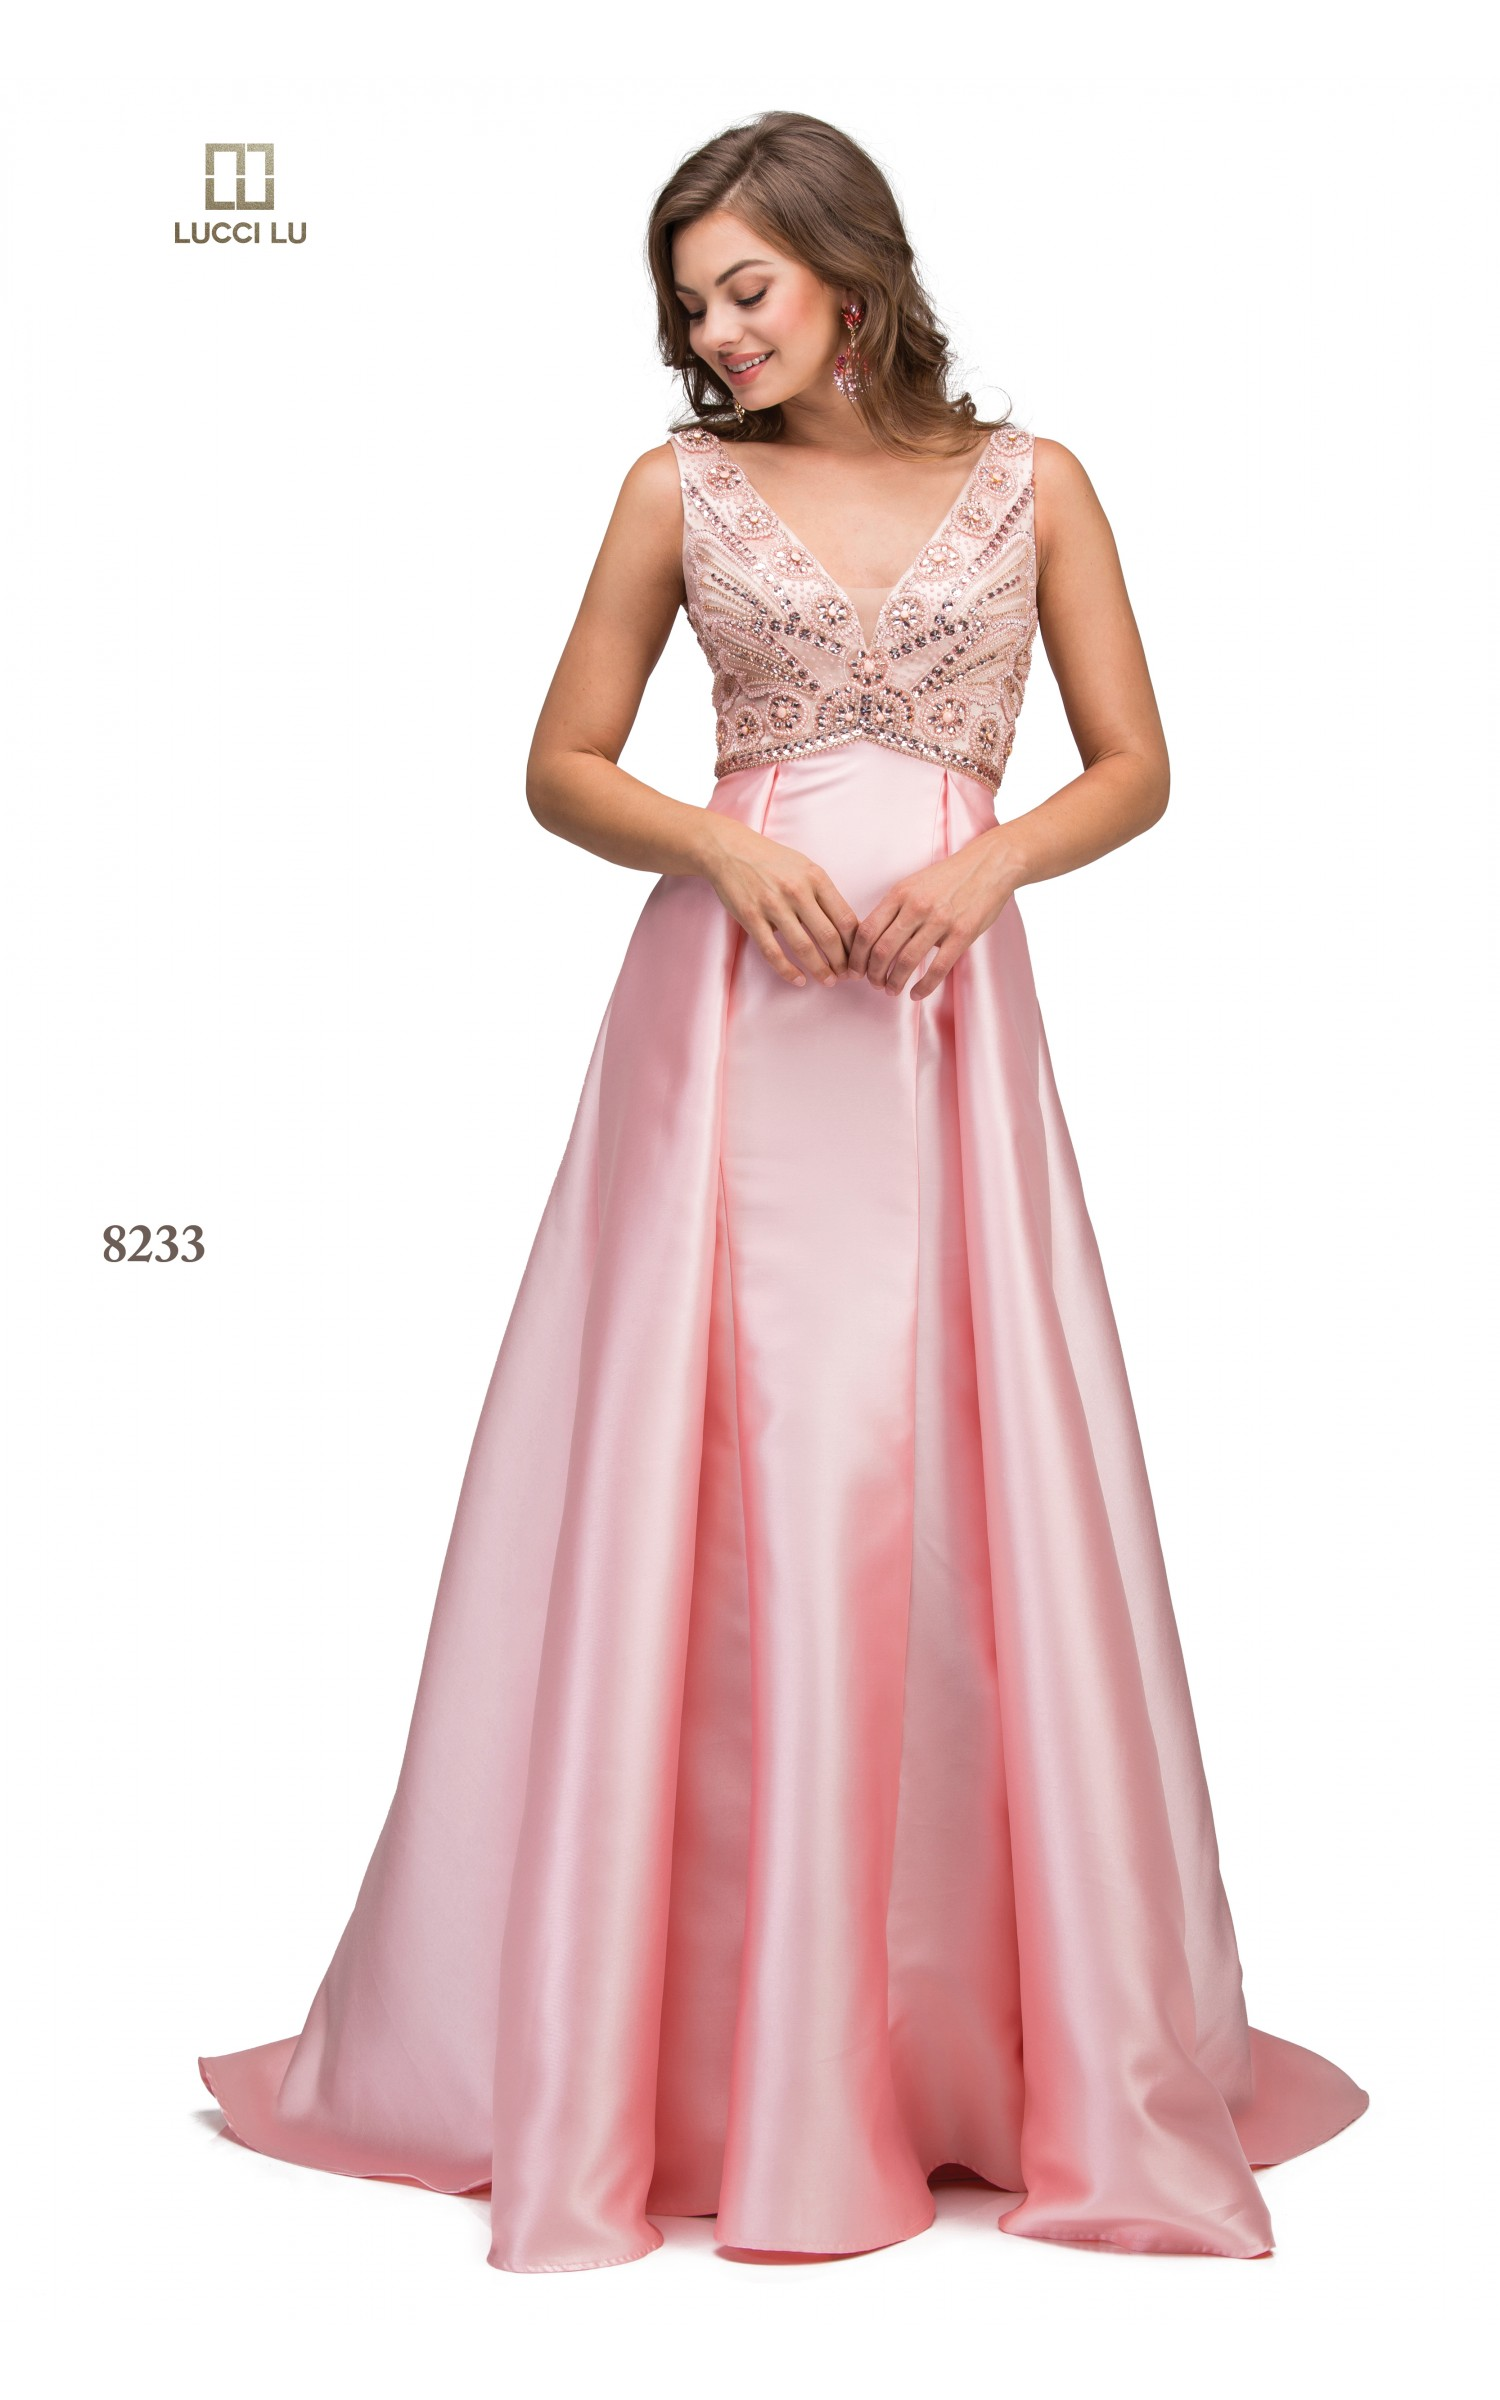 LUCCI LU Dress|Abby Paris Dress|Scala Dress|LUCCI LU 8231|Abby Paris ...